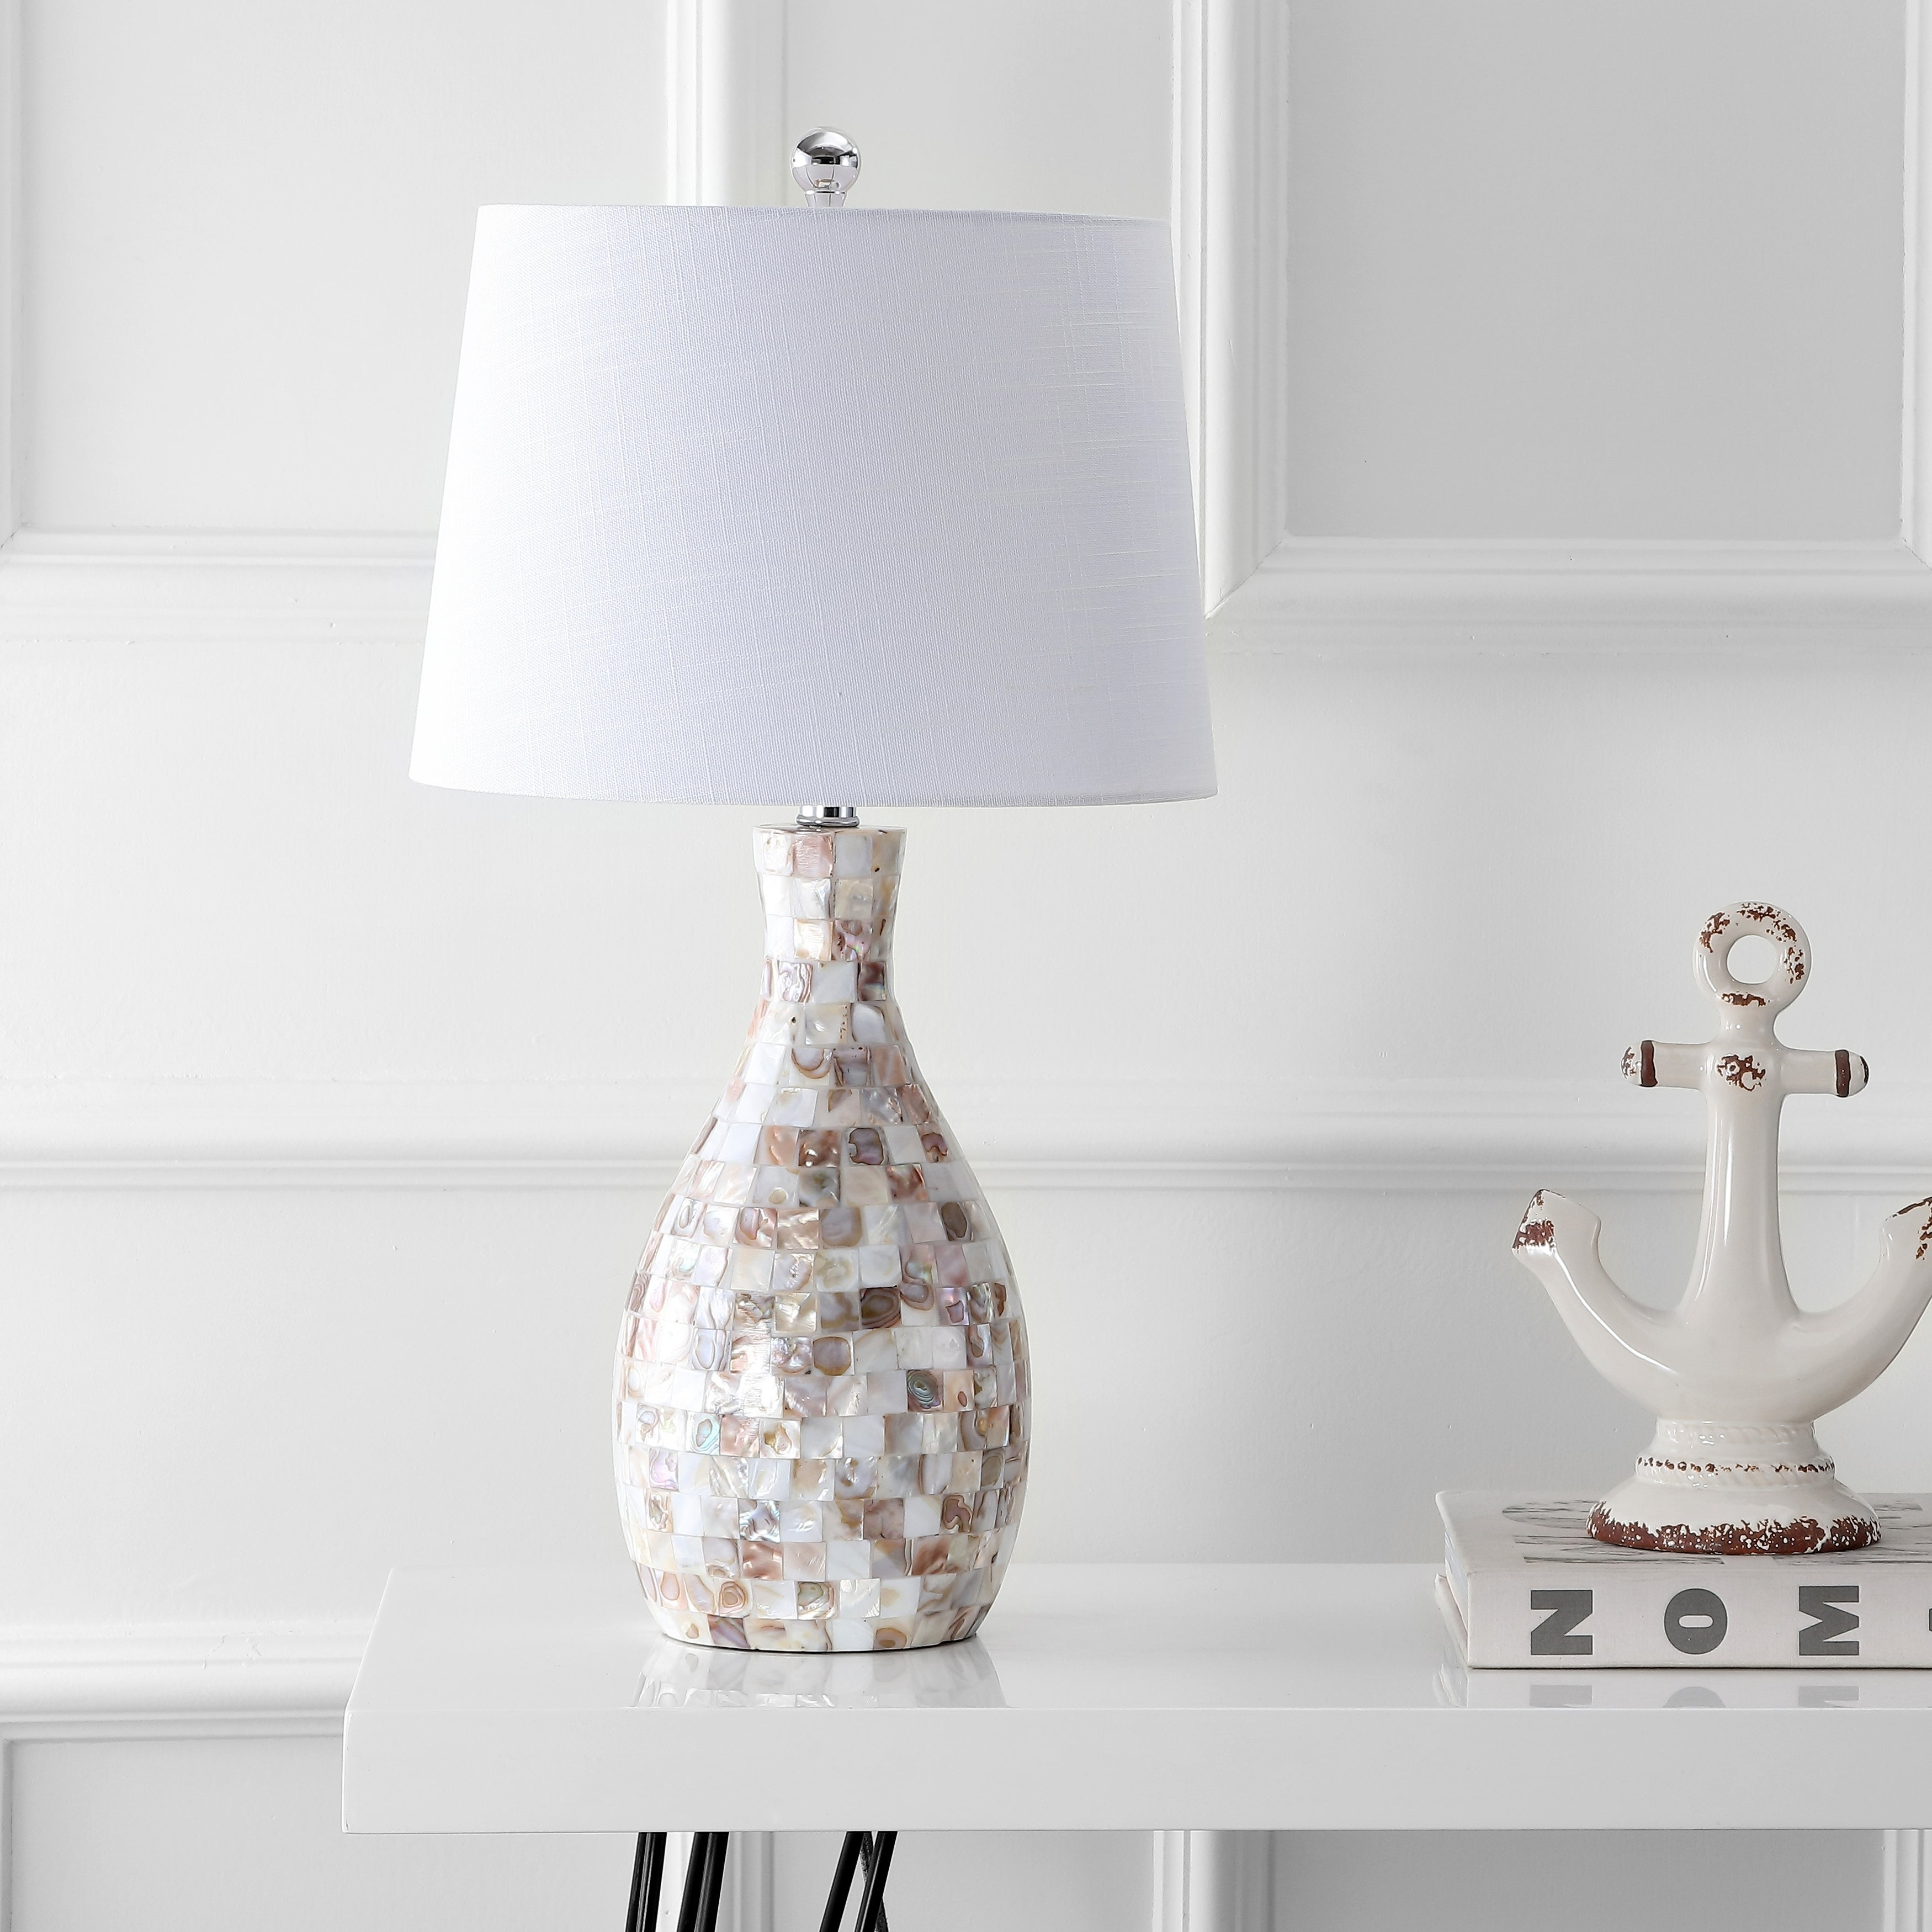 SEA  SHELL  ELECTRIC  LIGHTING  LAMP  SHADE  FINIAL NEW